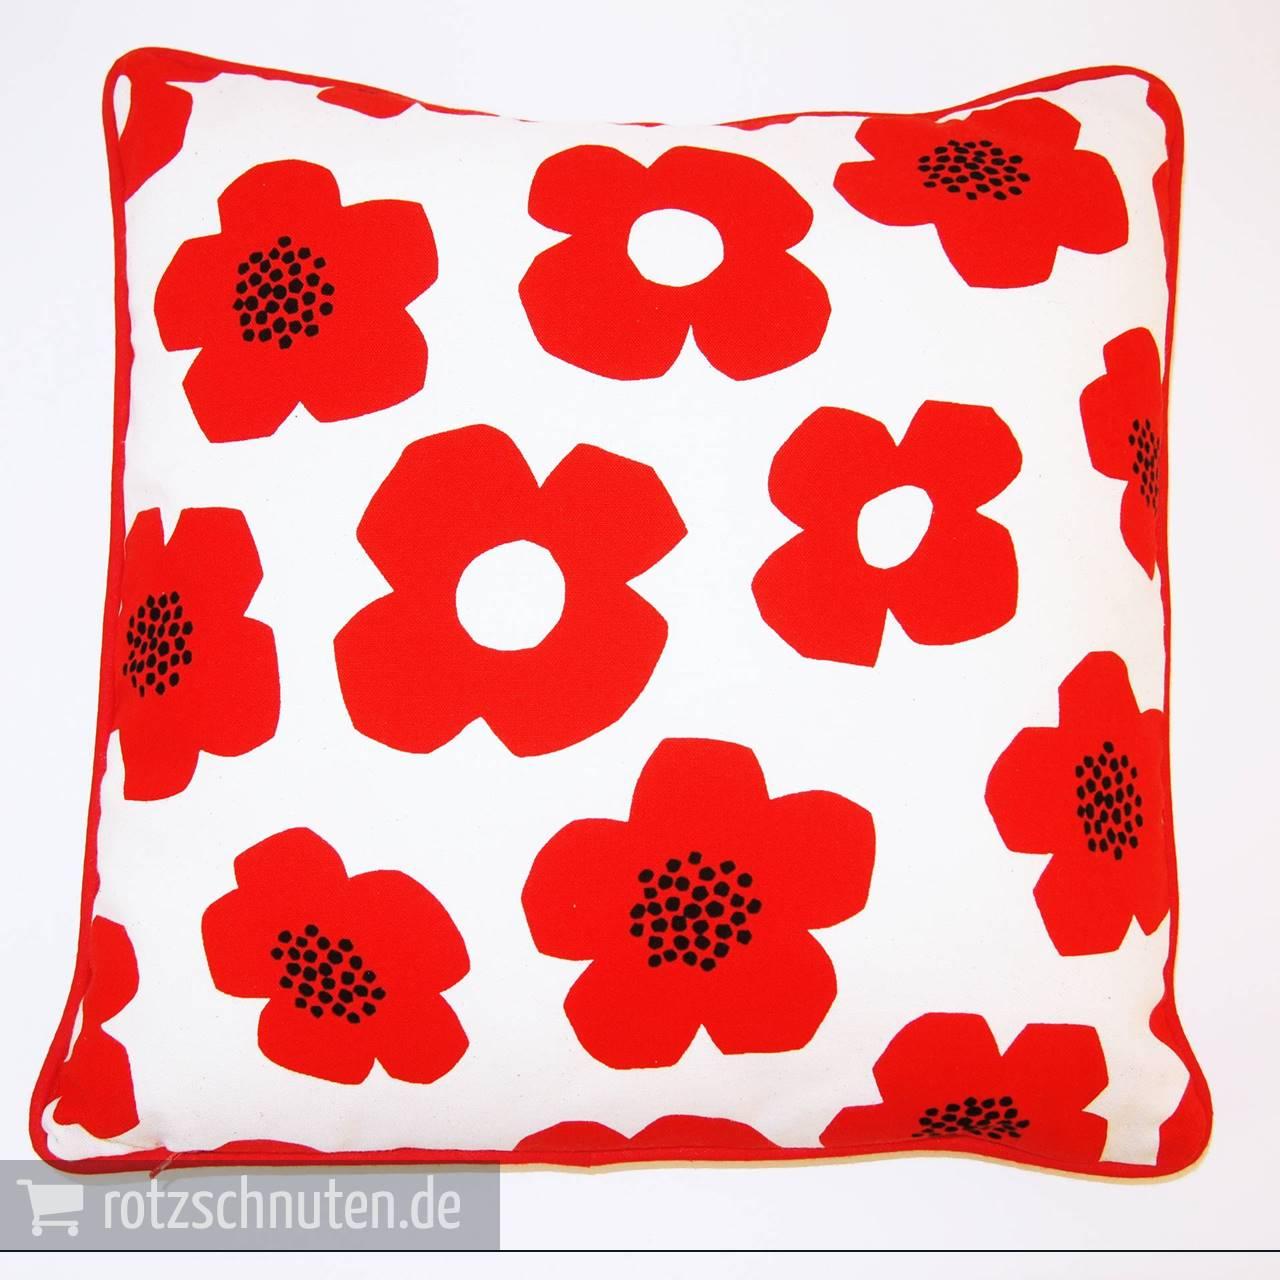 deko wende kissen h lle scandinavian no 1 baumwolle canvas bl ten rot rotznasen zuckerschnuten. Black Bedroom Furniture Sets. Home Design Ideas